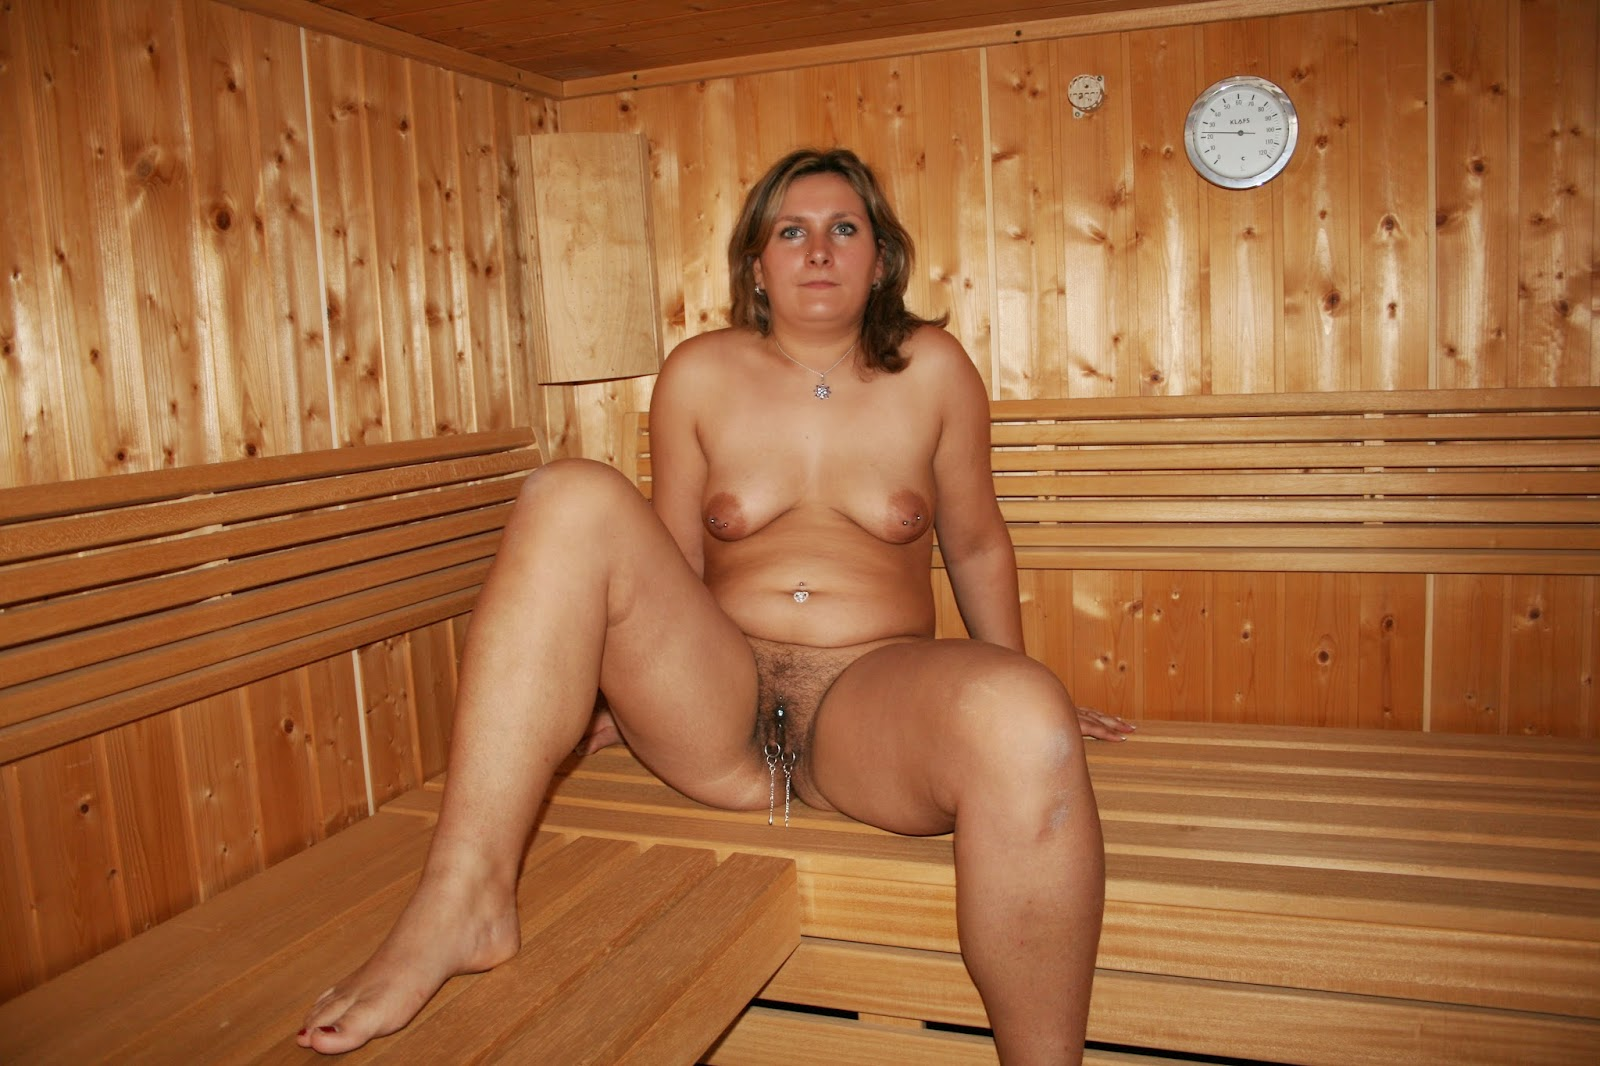 Nude softcore mature women photo